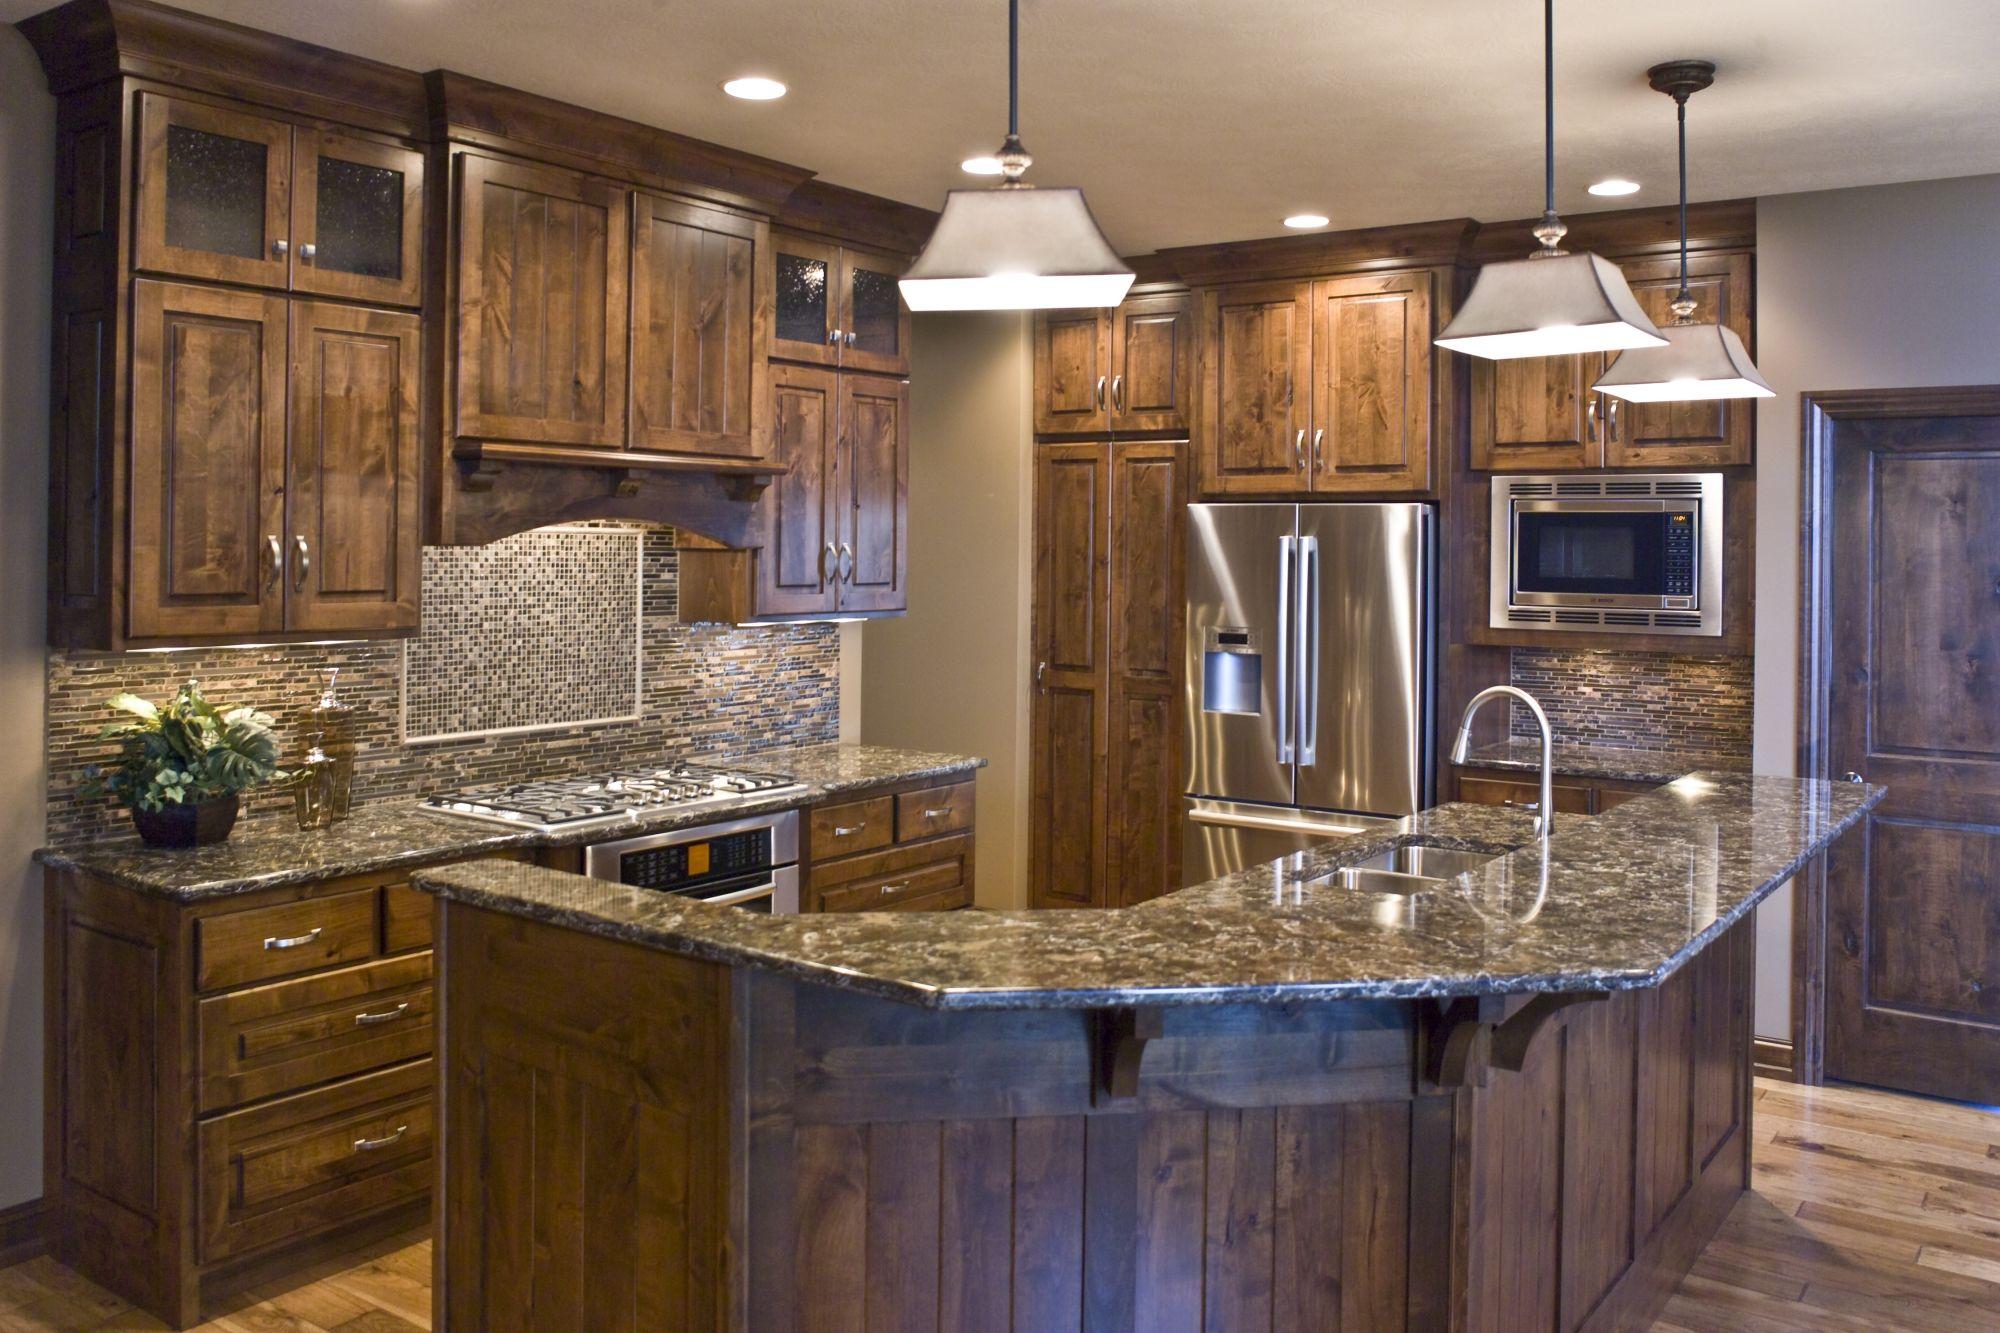 Knotty Alder Kitchen (Cultivate.com) | New Home | Pinterest | Cocinas